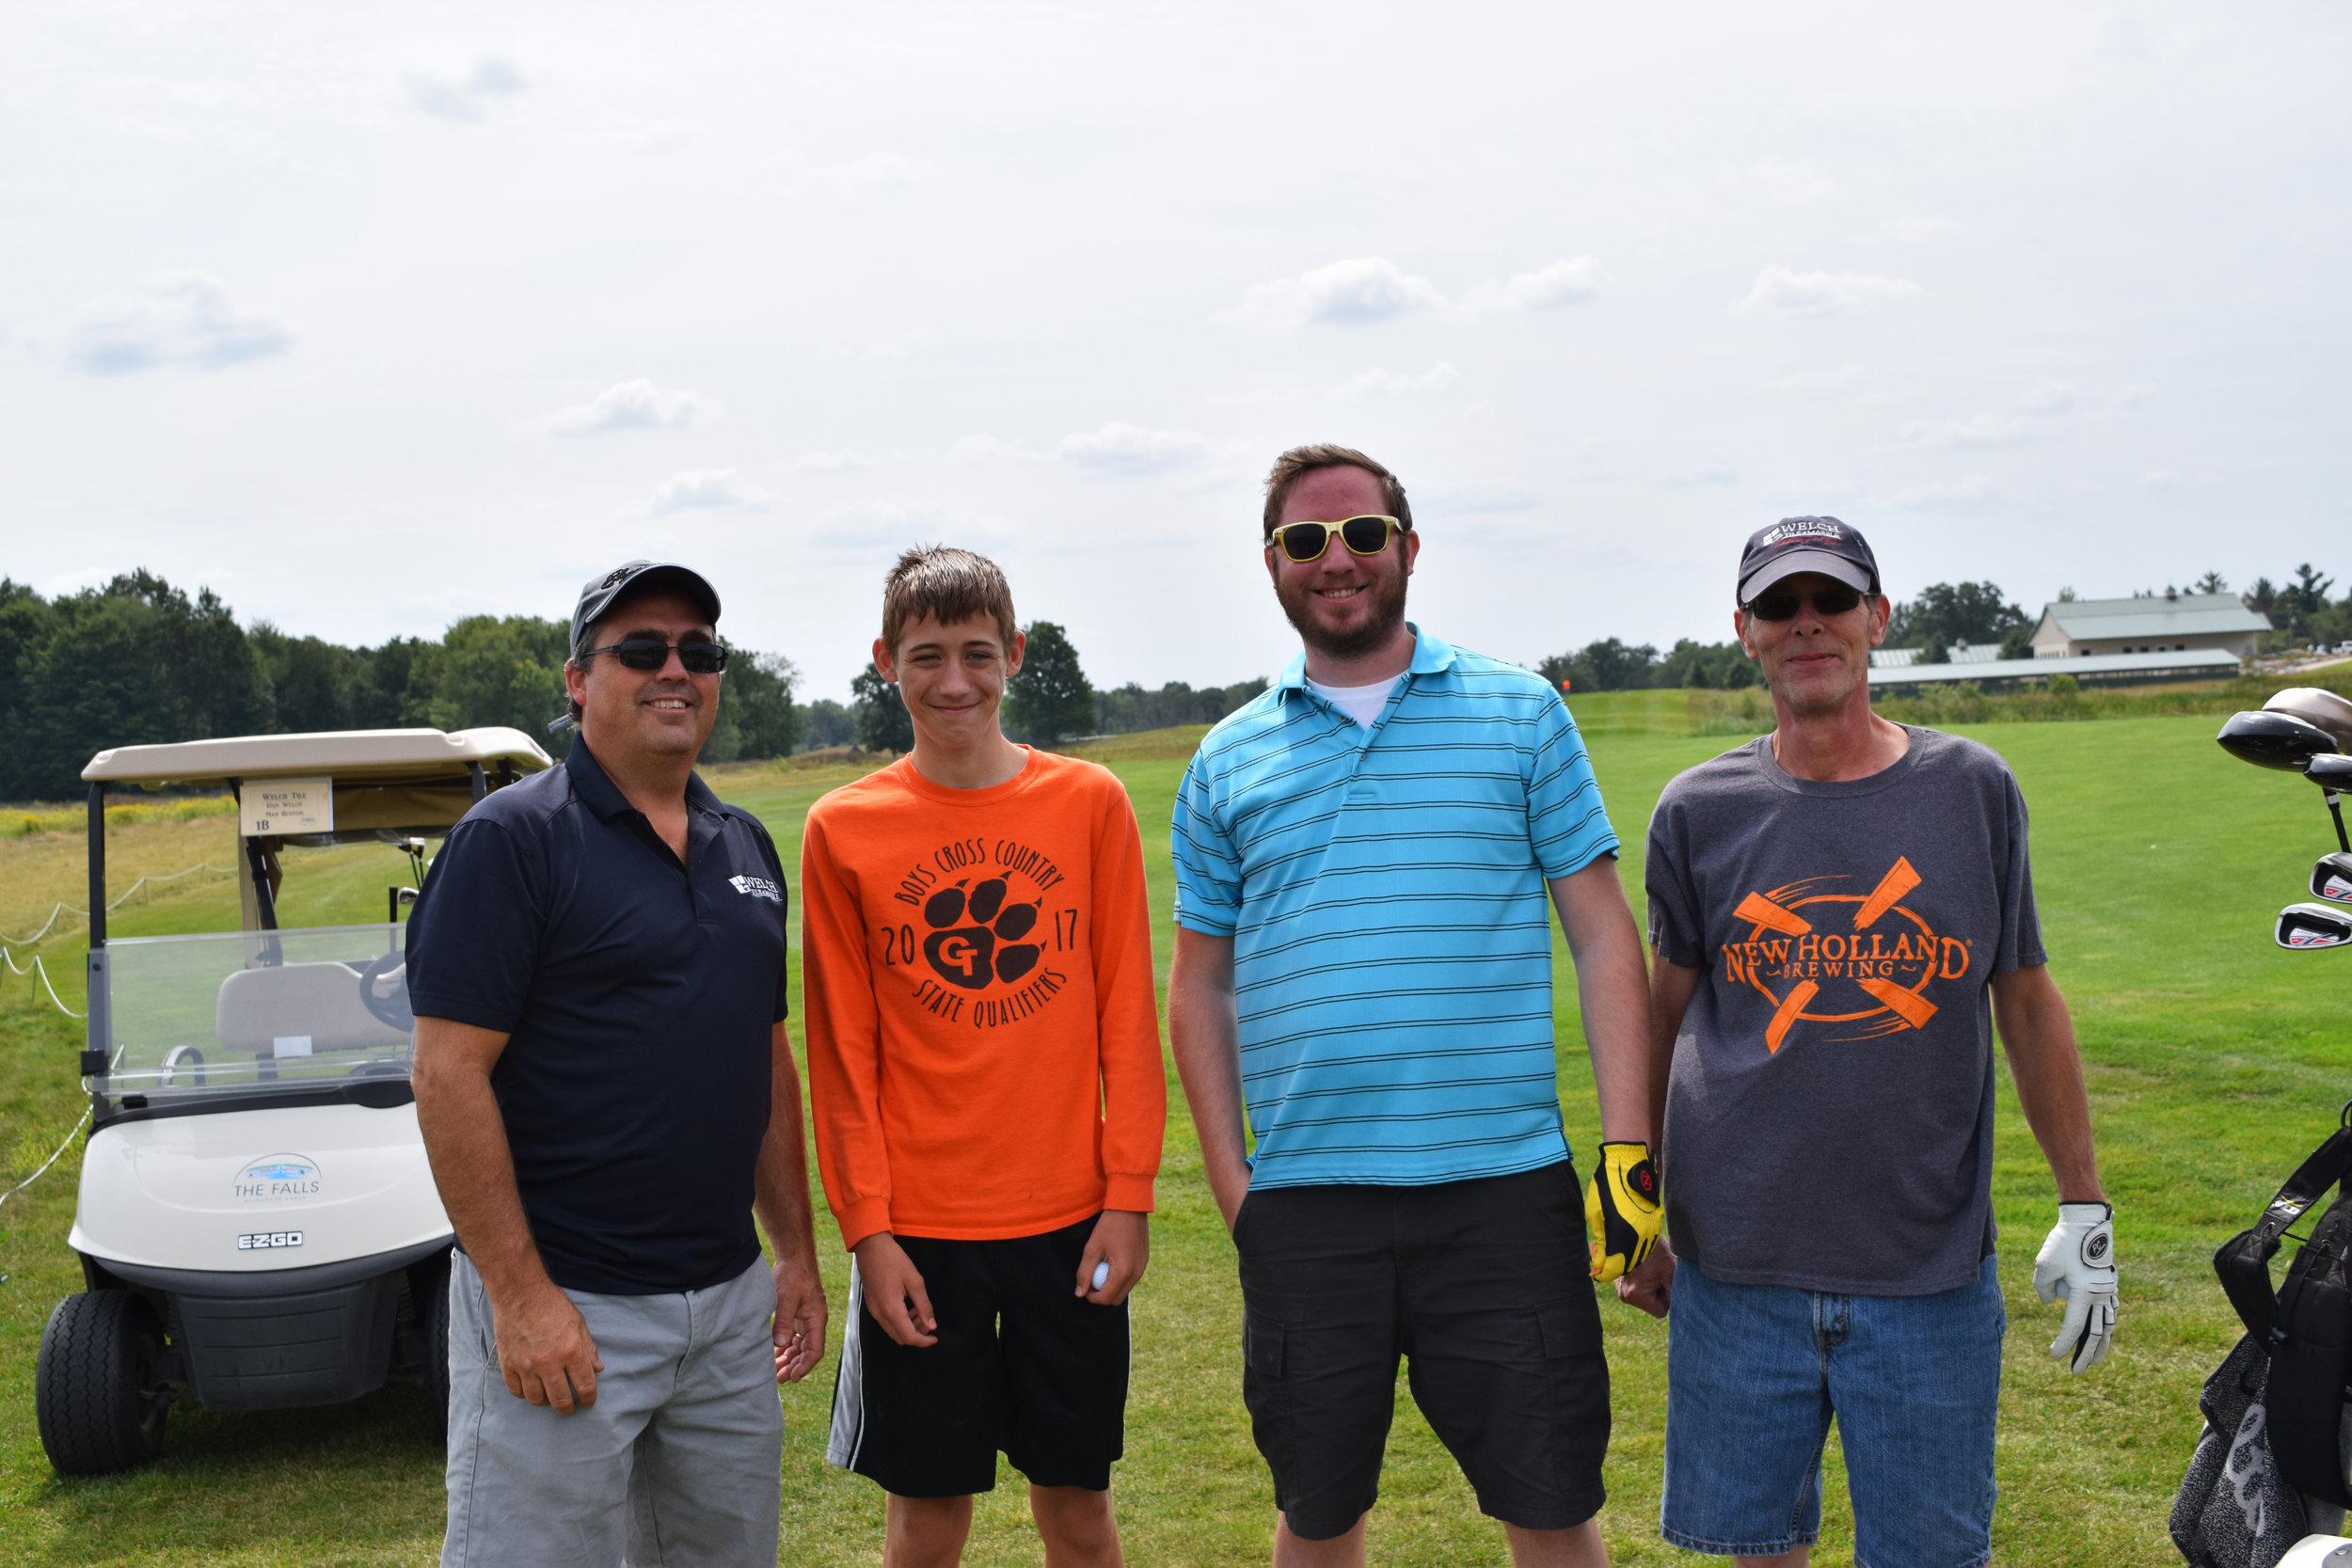 Team: Left to right- Dan Welch, Reece Welch, guest of Jeff Beek, Jeff Beek